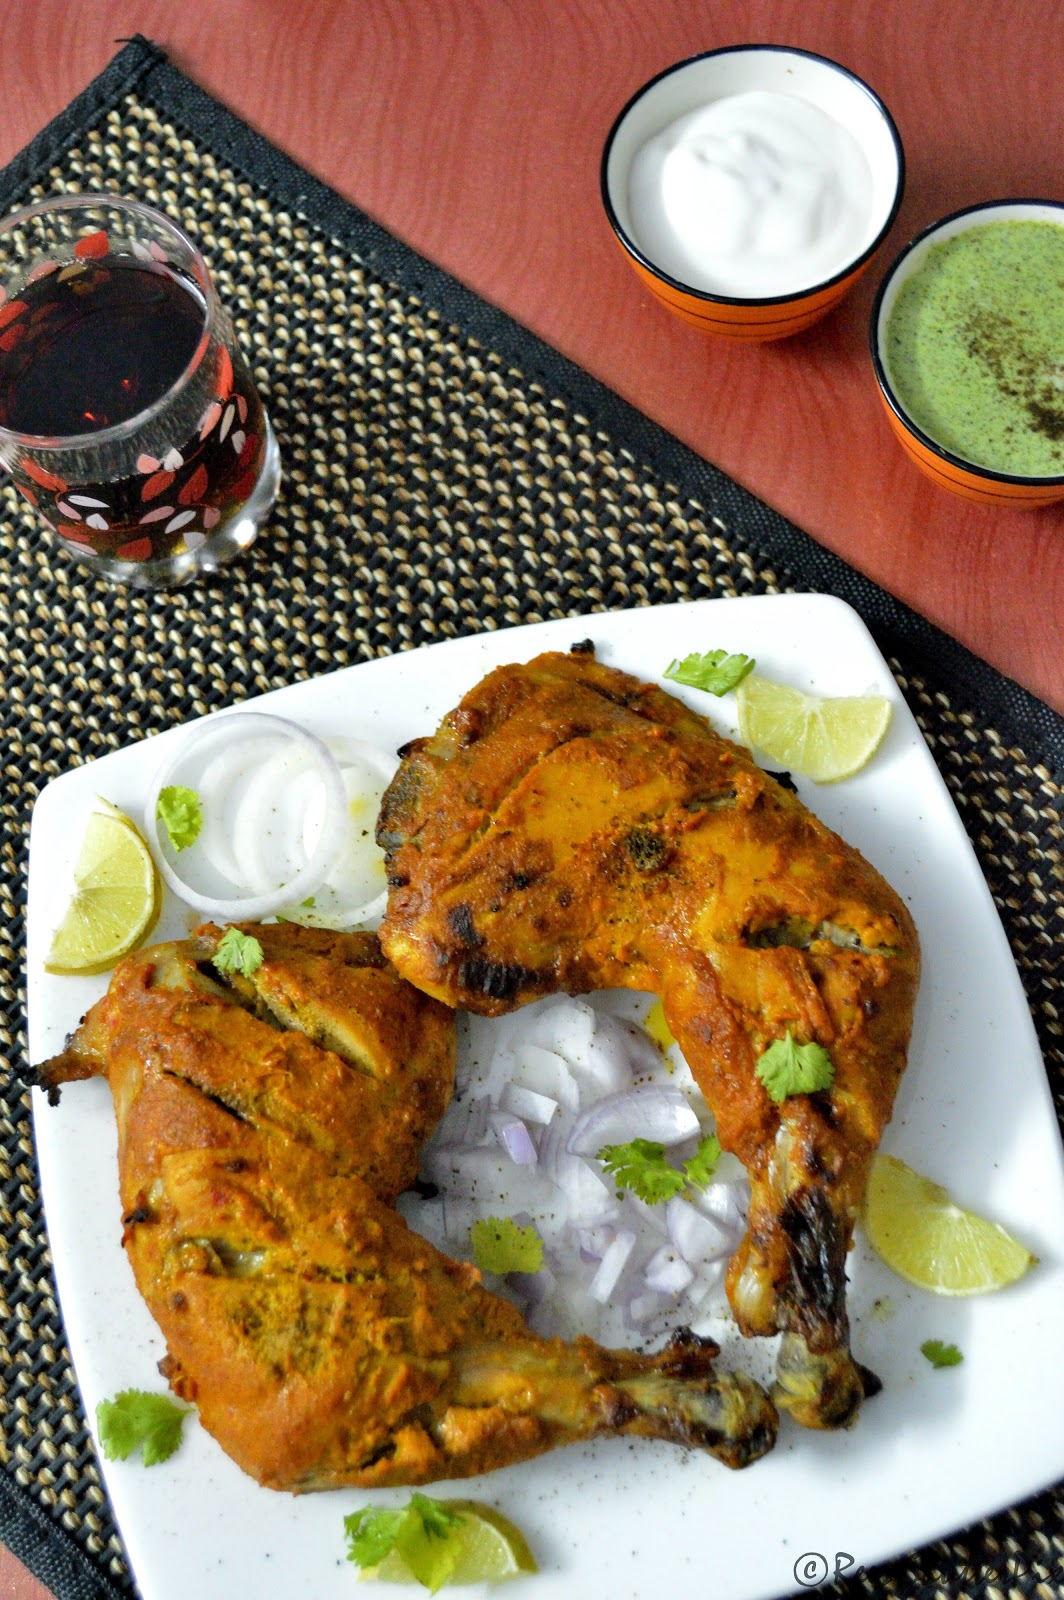 Tandoori Chicken Recipe,How to make tandoori chicken using microwave oven at home, Non Vegetarian Recipes, easy non veg starter recipe, microwave cooking,microwave oven recipes, easy tandoori chicken.